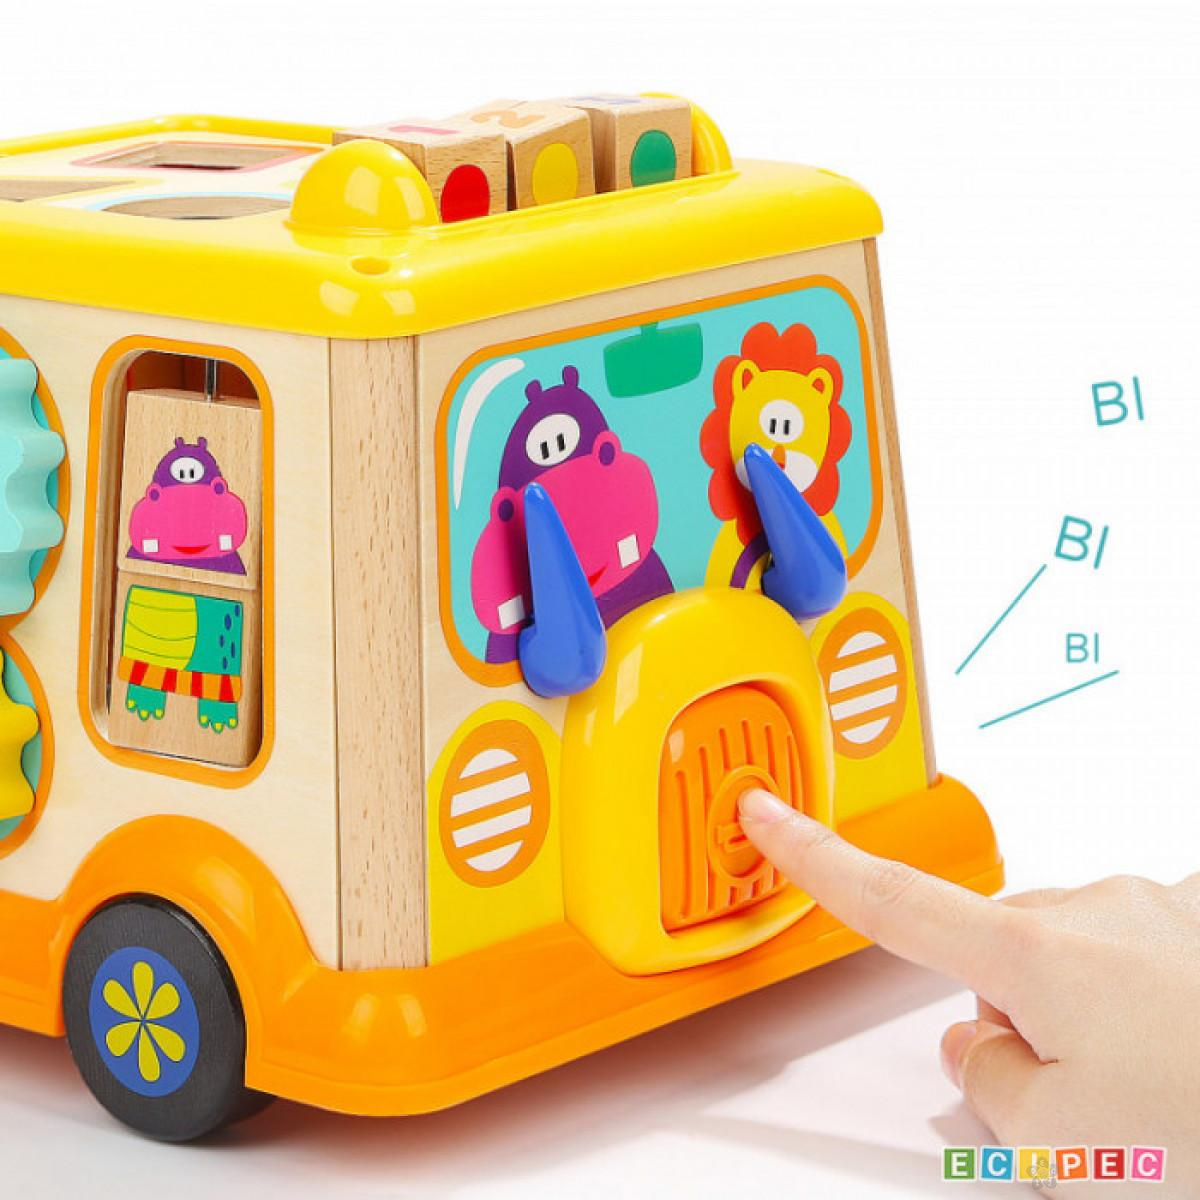 Didaktička igračka Školski autobus ToP Bright 150185